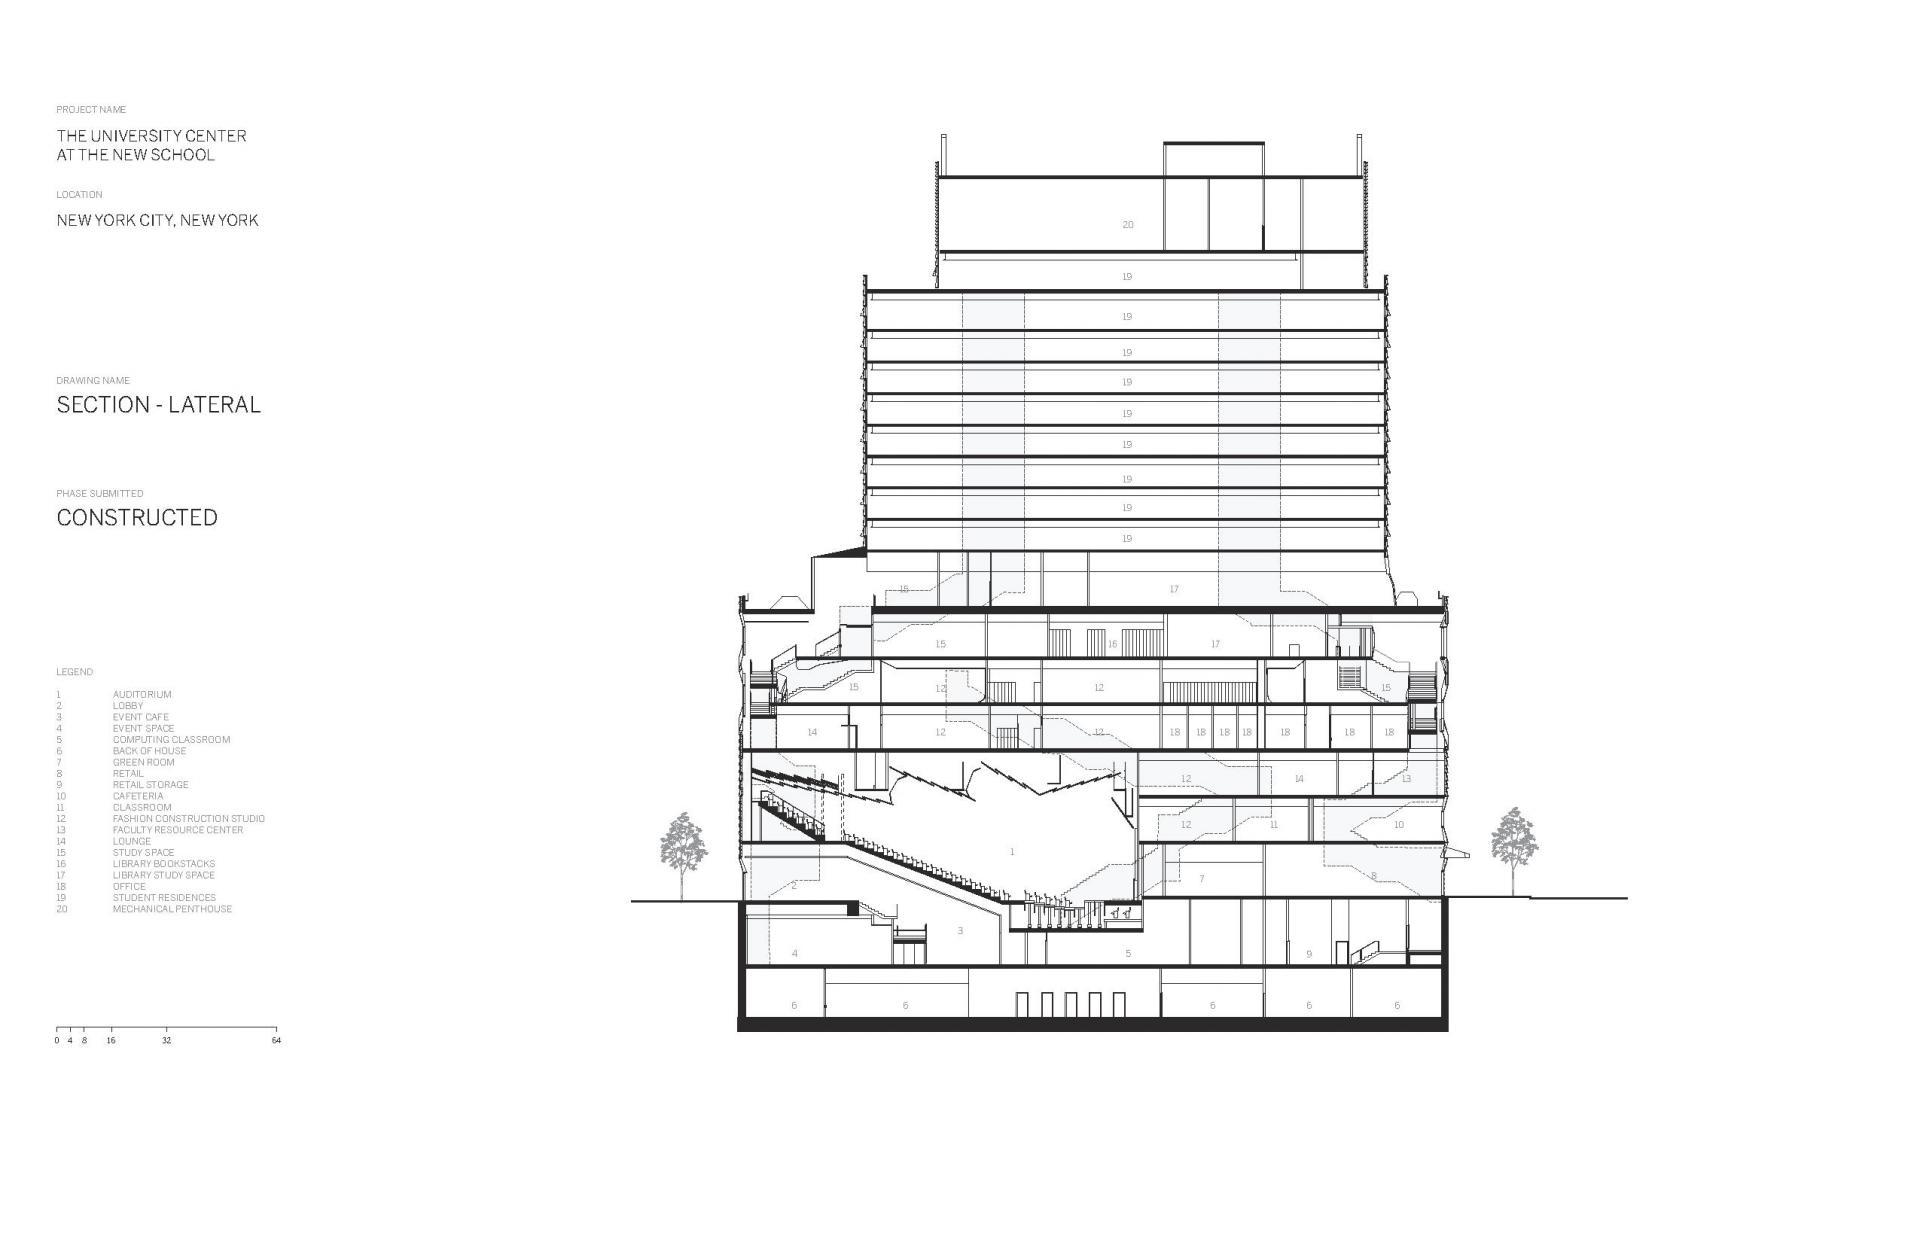 Схема учебного центра Greenwich Village в Нью Йорке - Фото 10